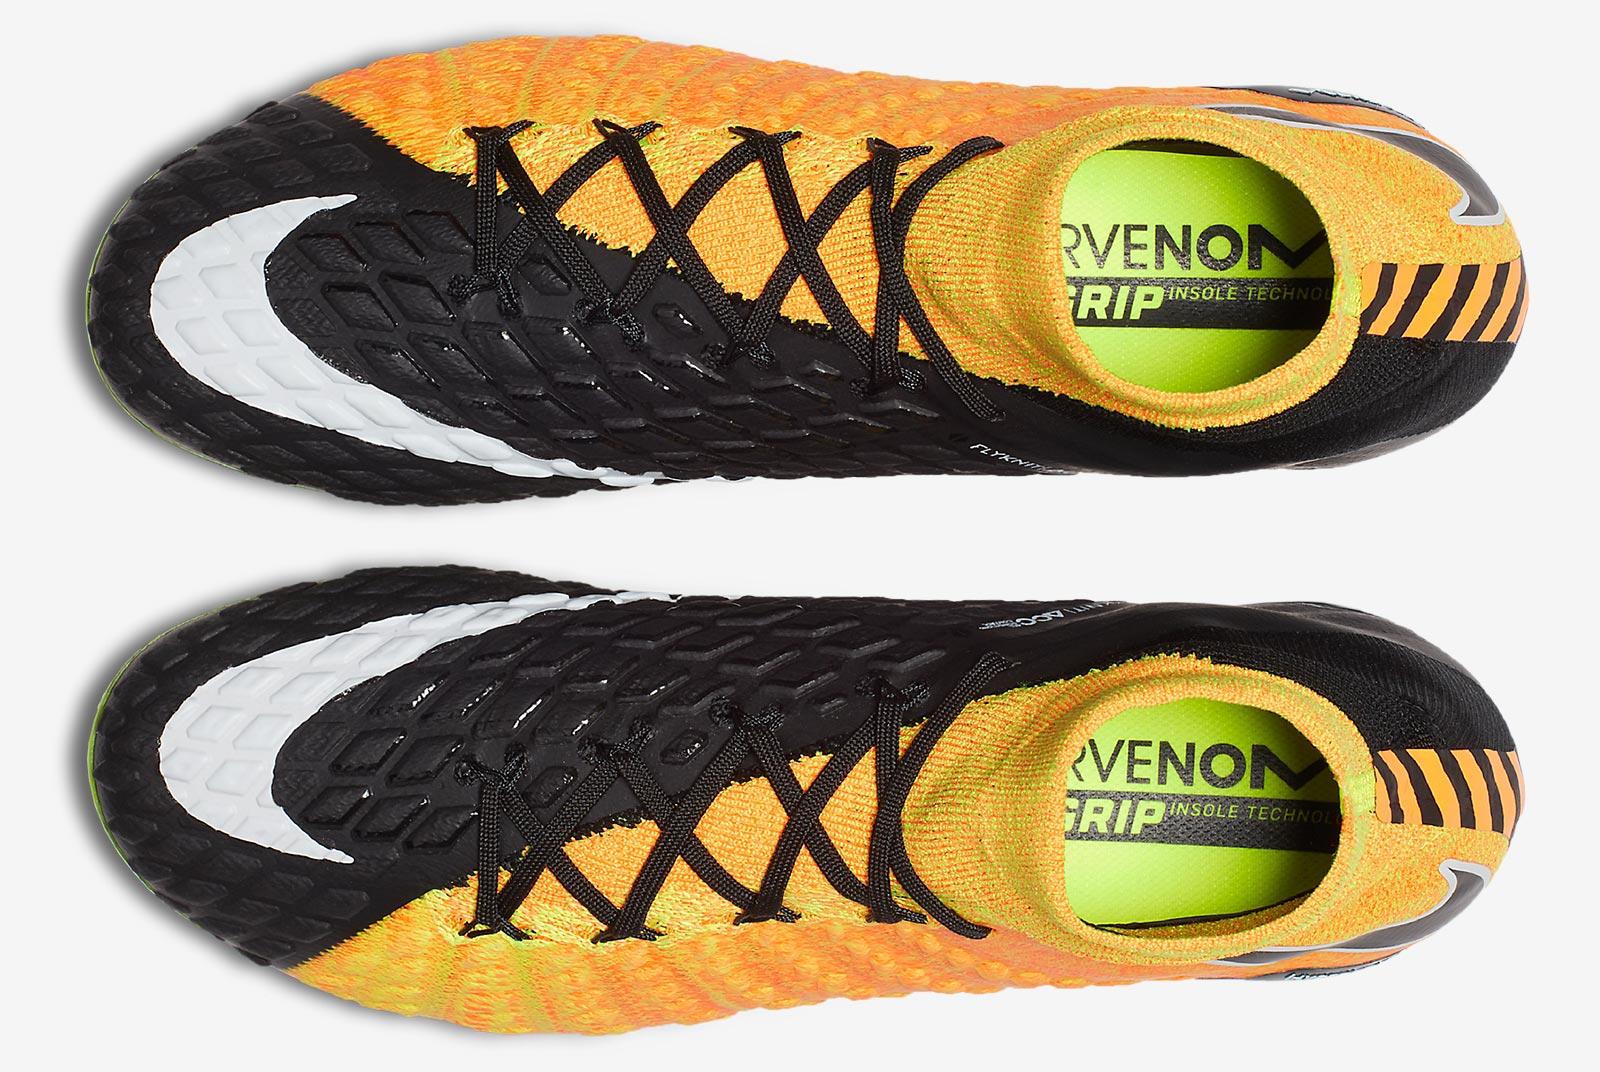 premium selection b5d0e fc2a6 Technische informatie Nike Hypervenom Phantom 3 voetbalschoenen